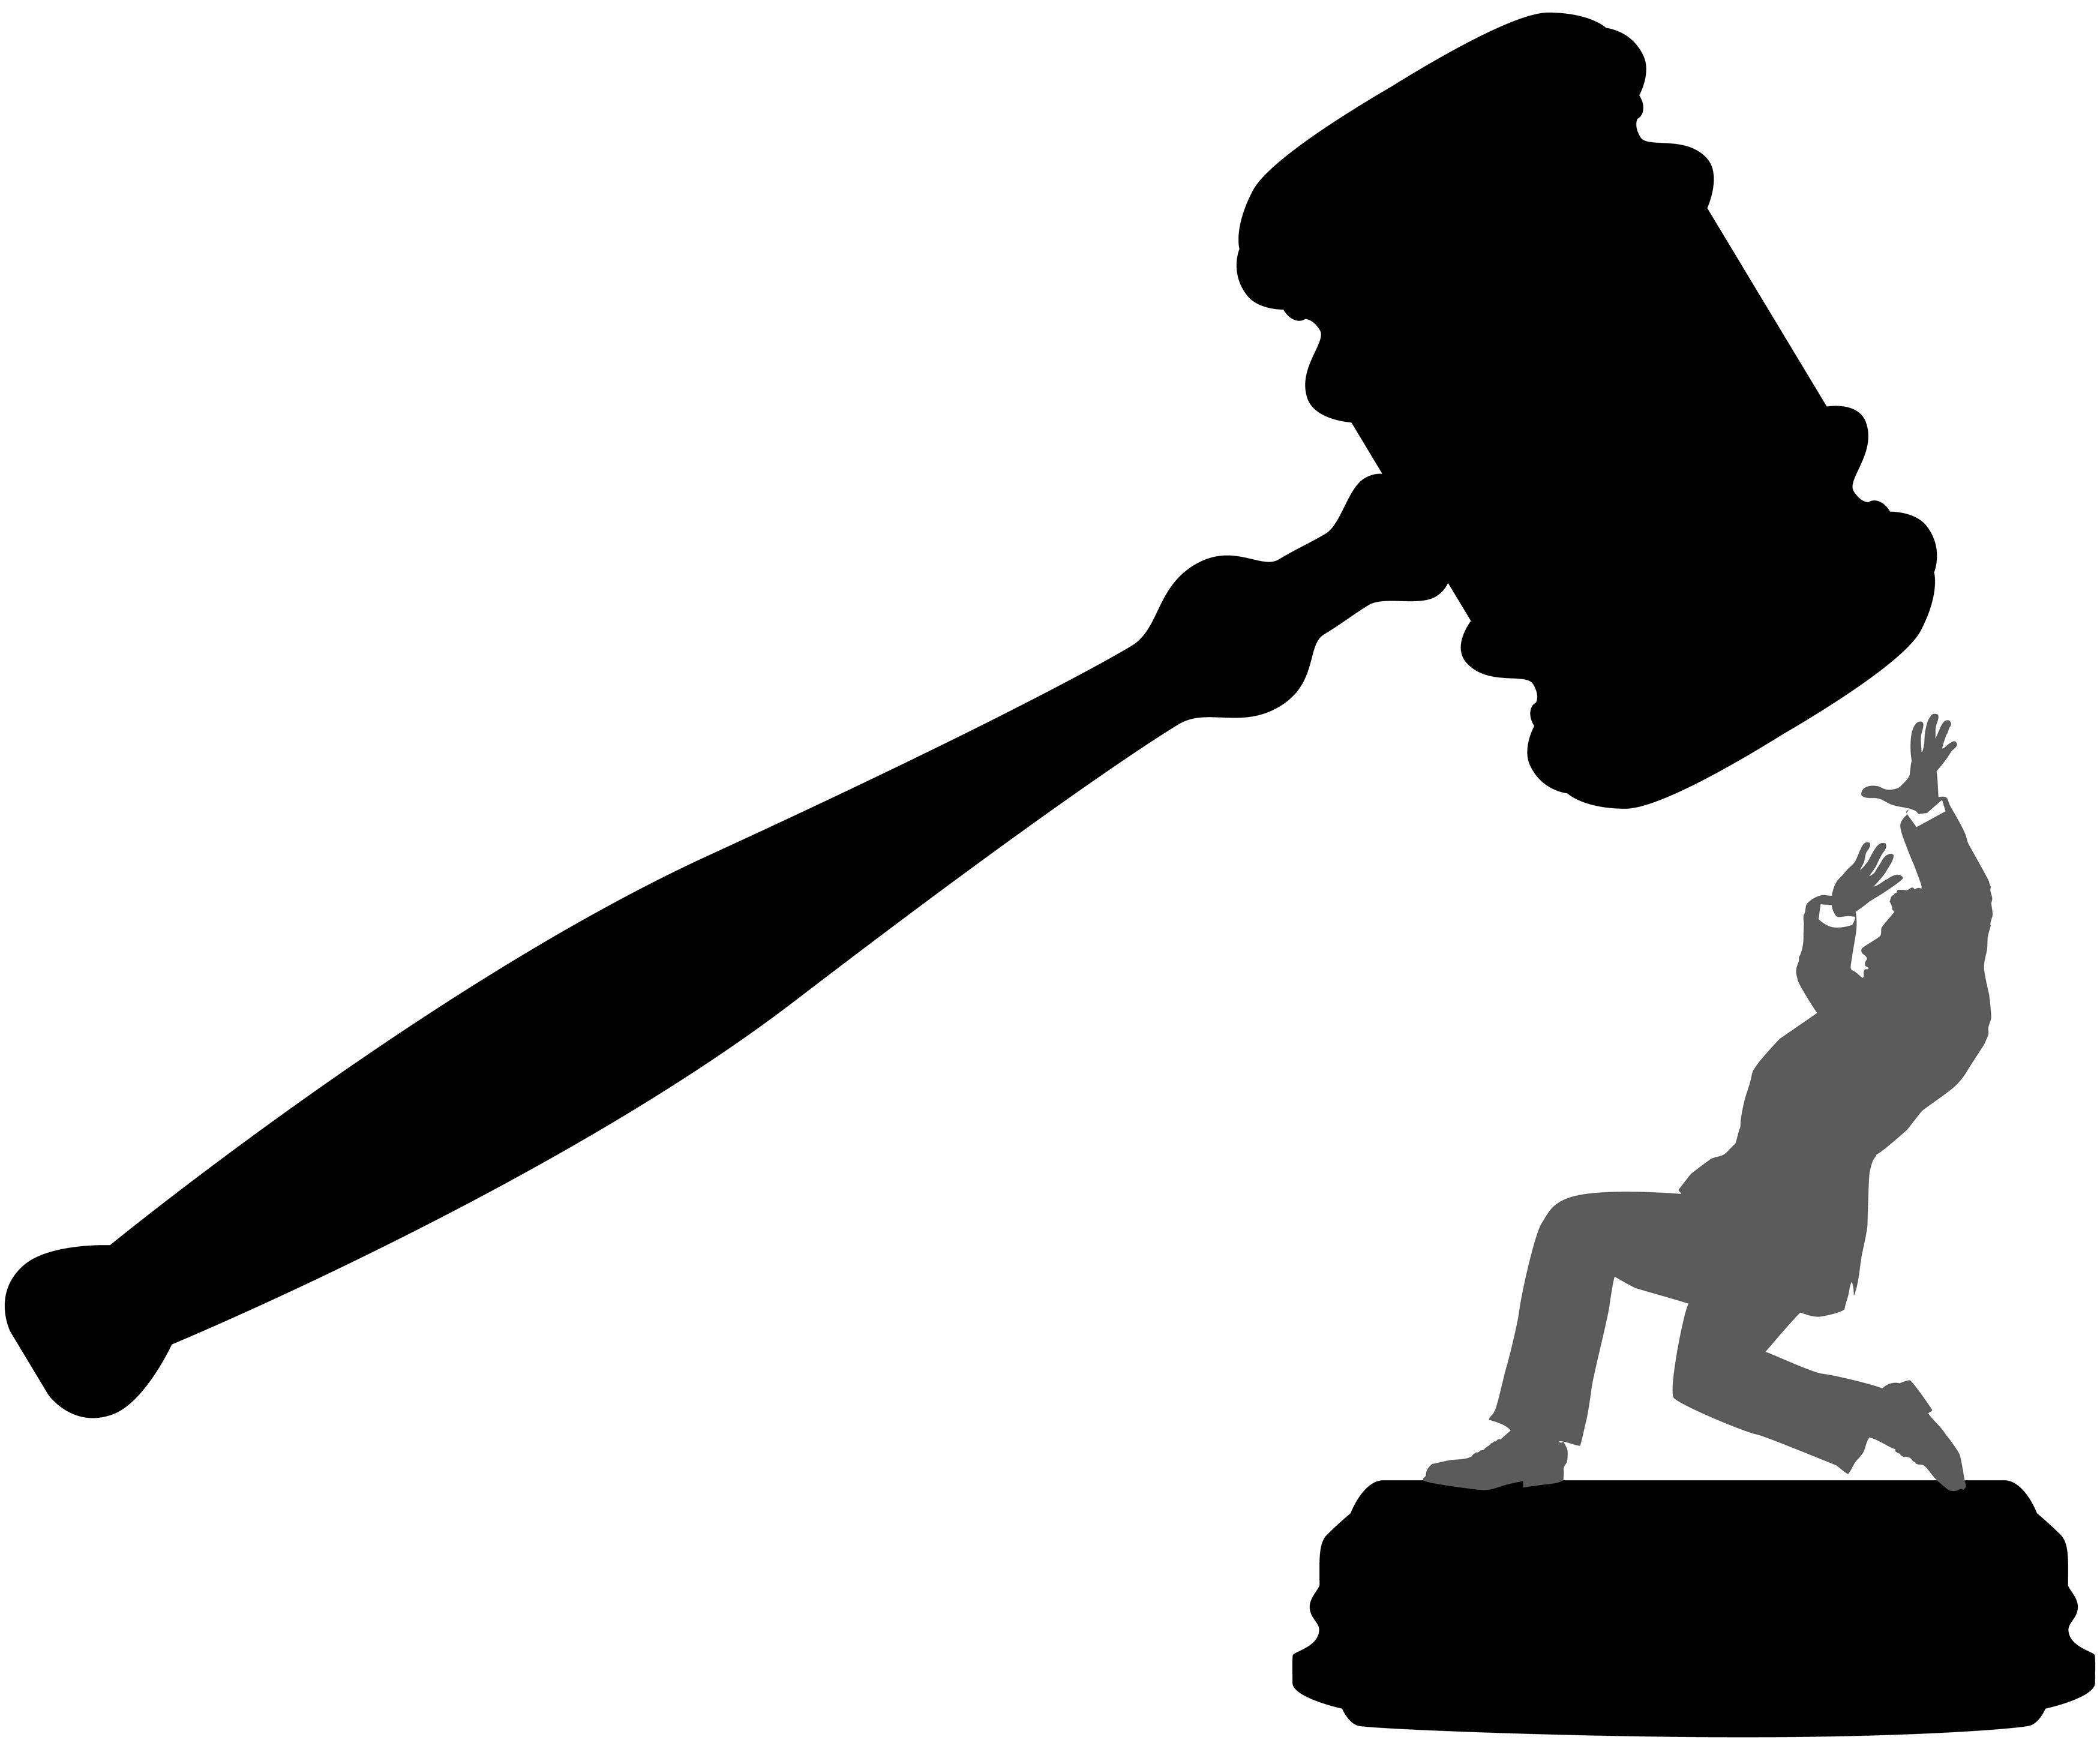 Law Gavel Clipart Clipart Kid Divorce Human Silhouette Clip Art